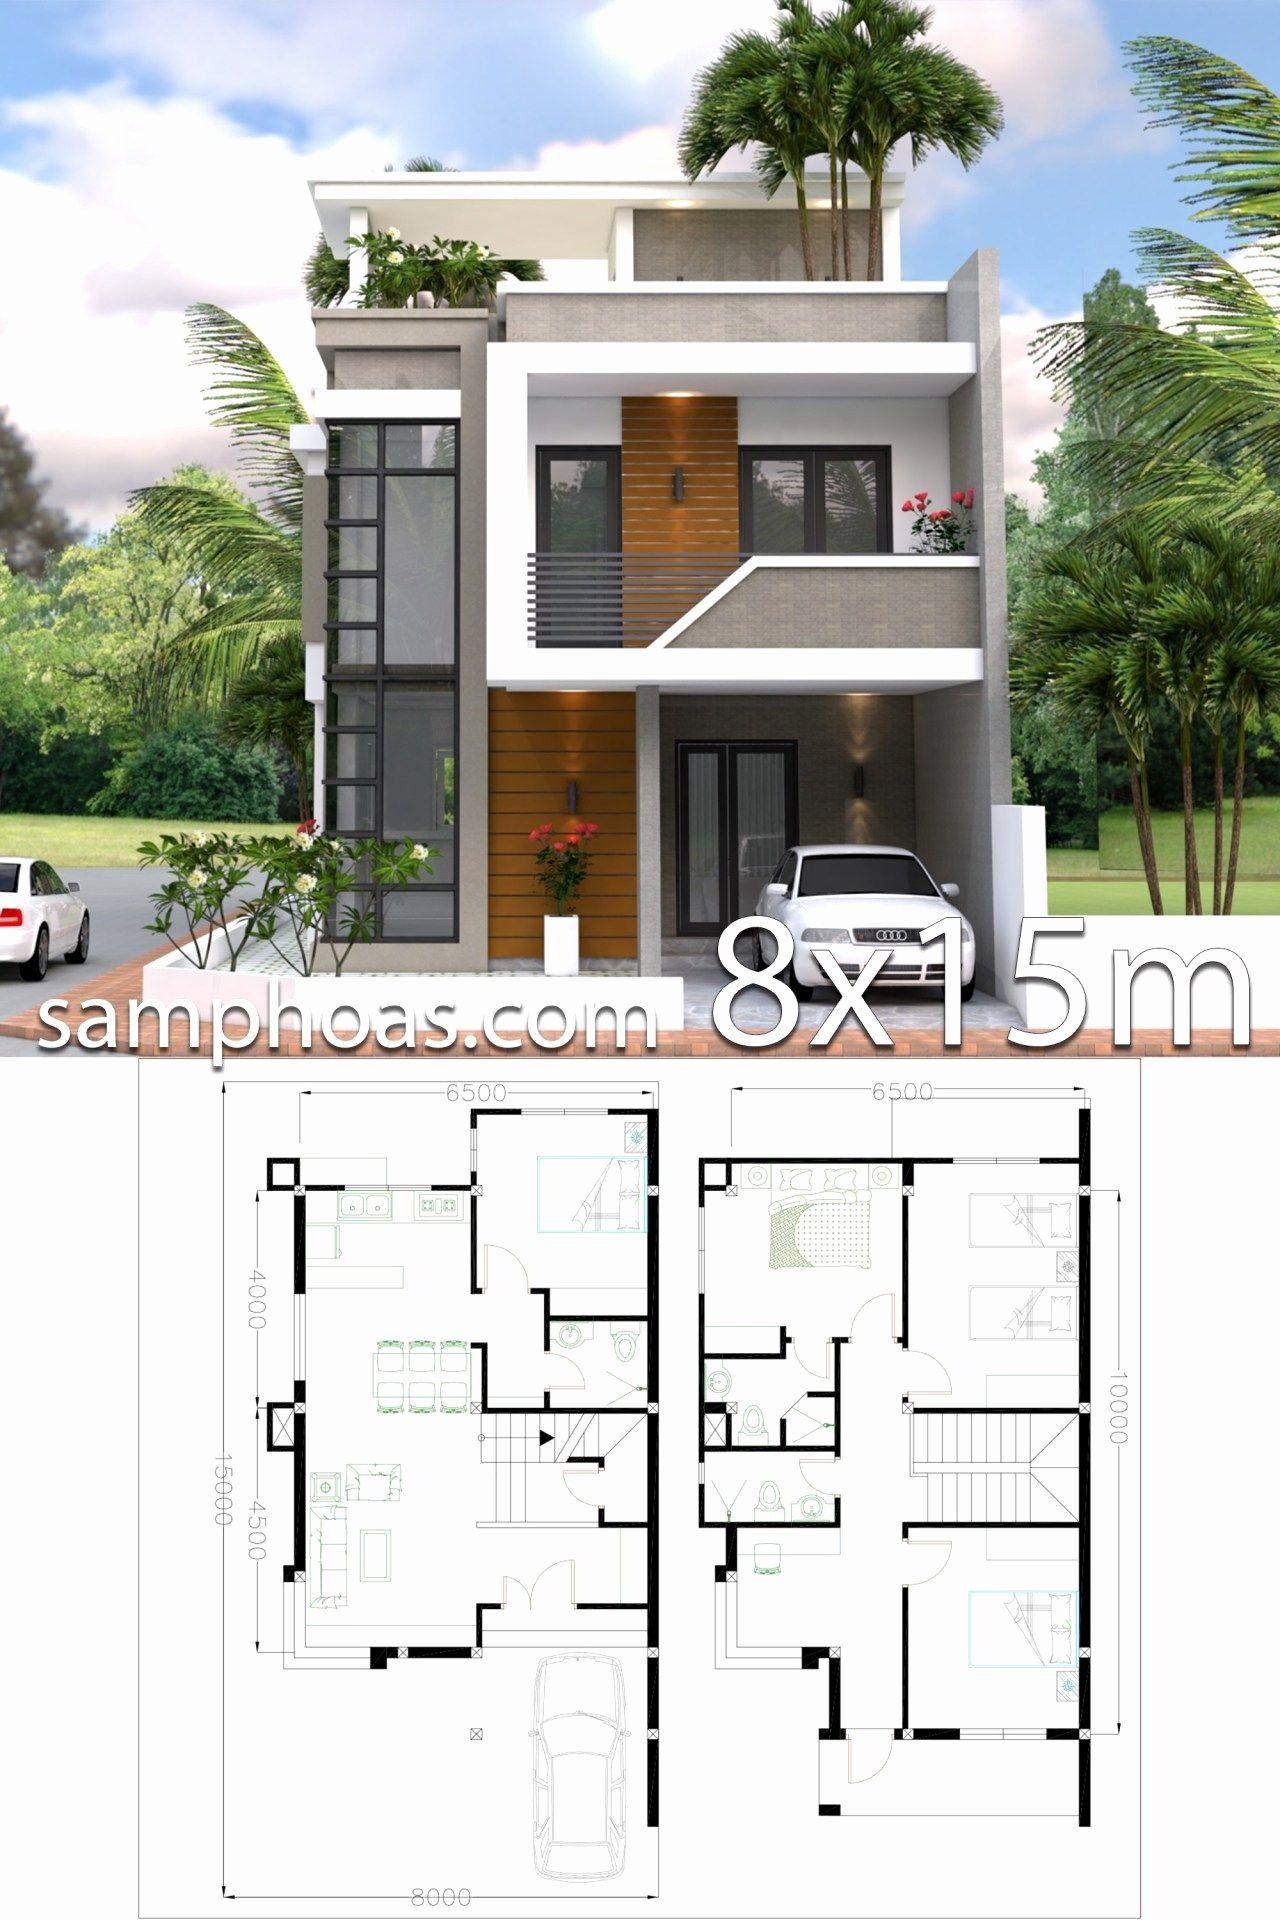 4 Bedroom Duplex House Plans Elegant Home Design Plan